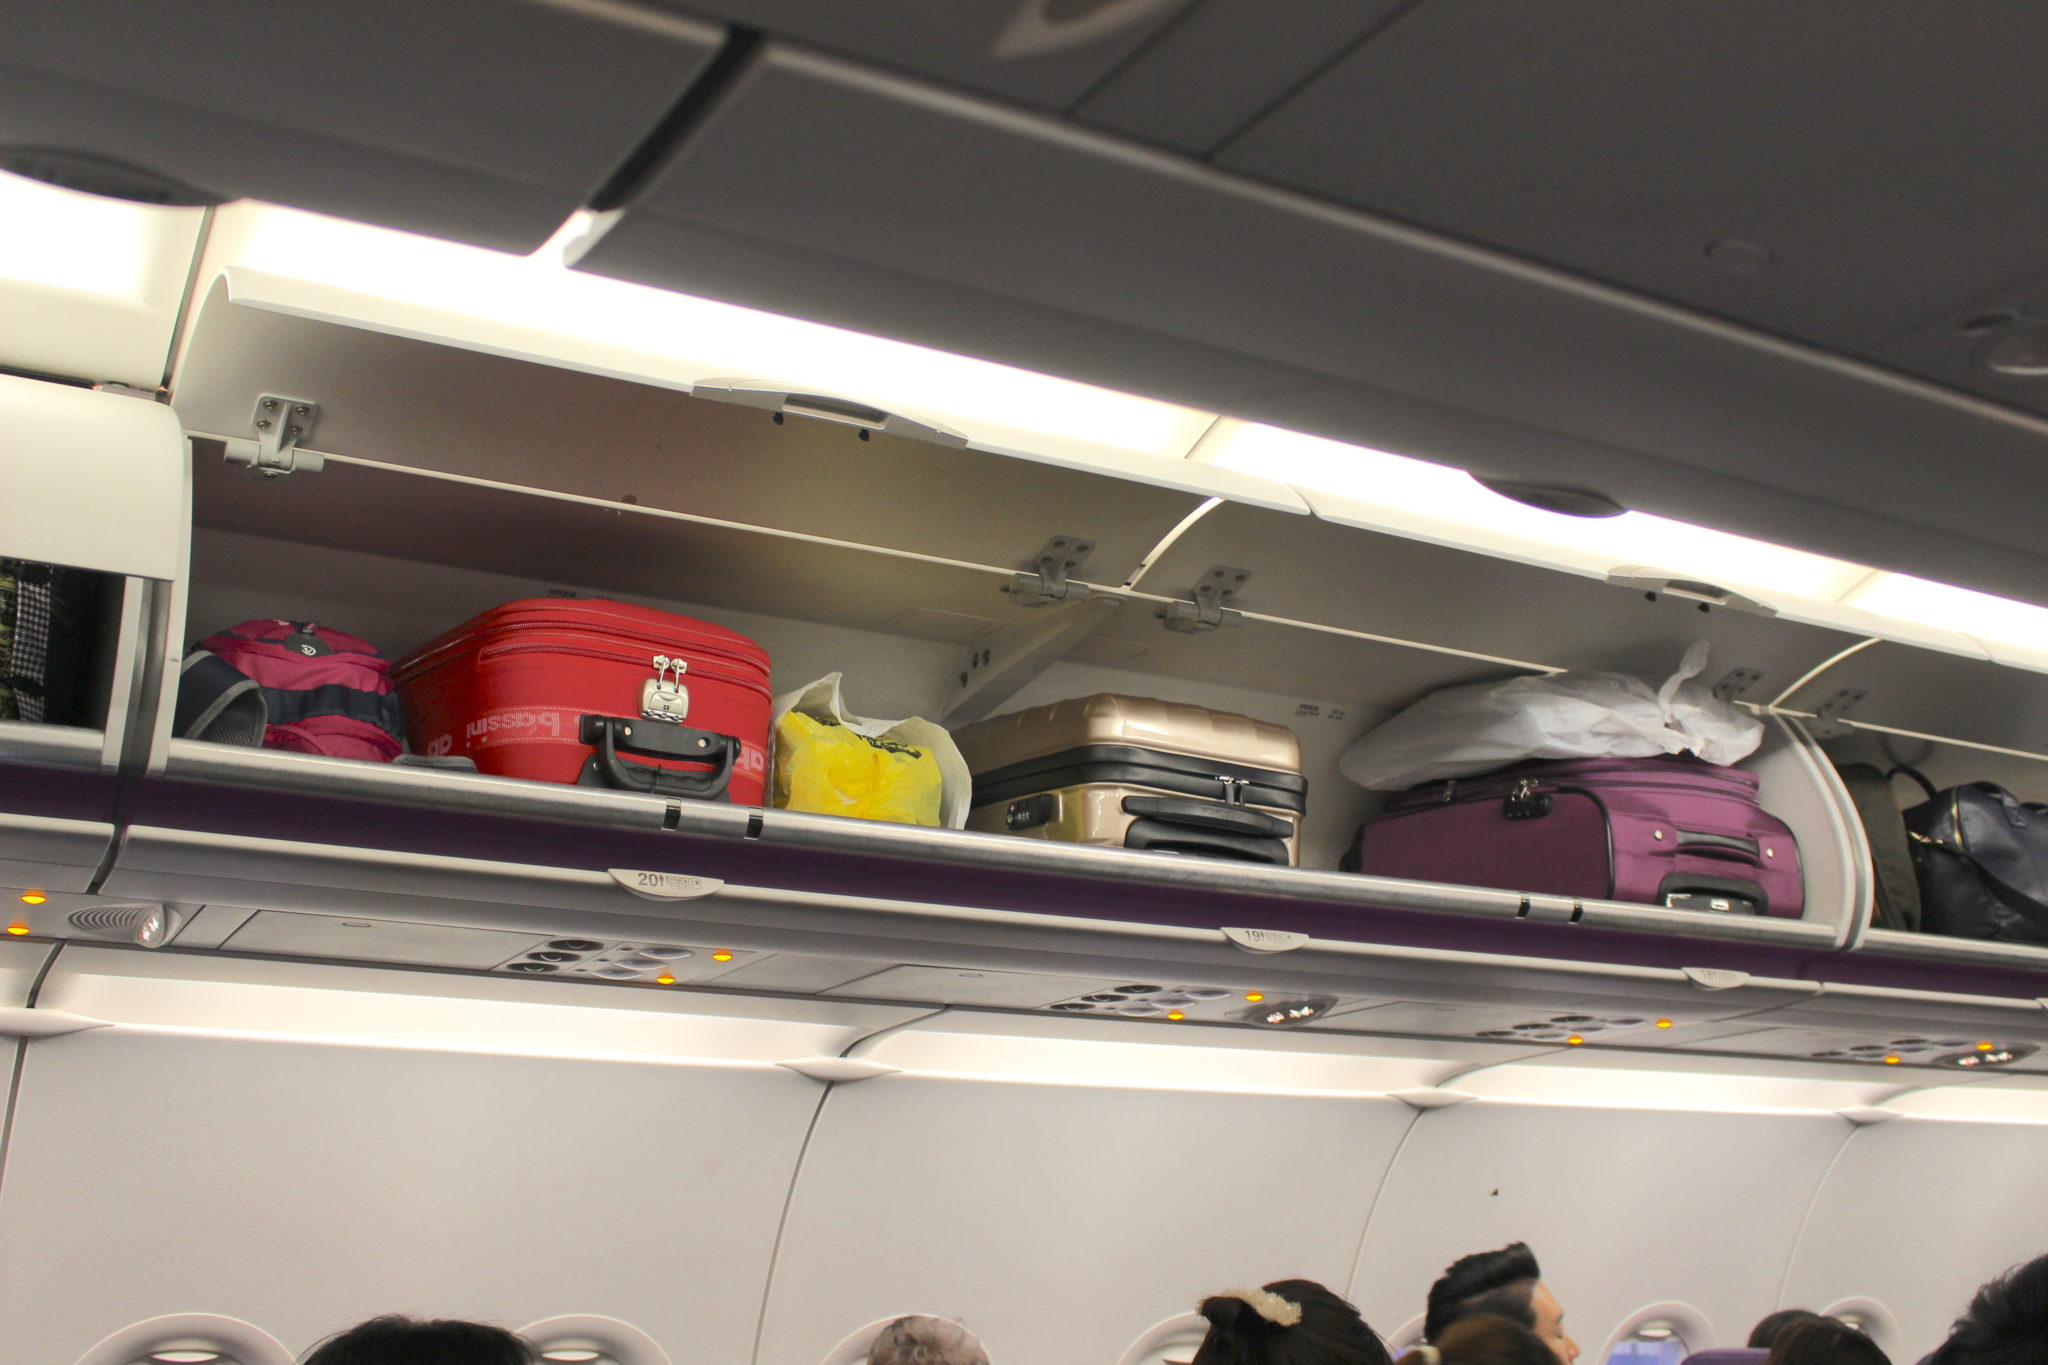 Lufthansa Ryanair Try Carrot And Stick Cabin Bag Approaches Runway Girlrunway Girl